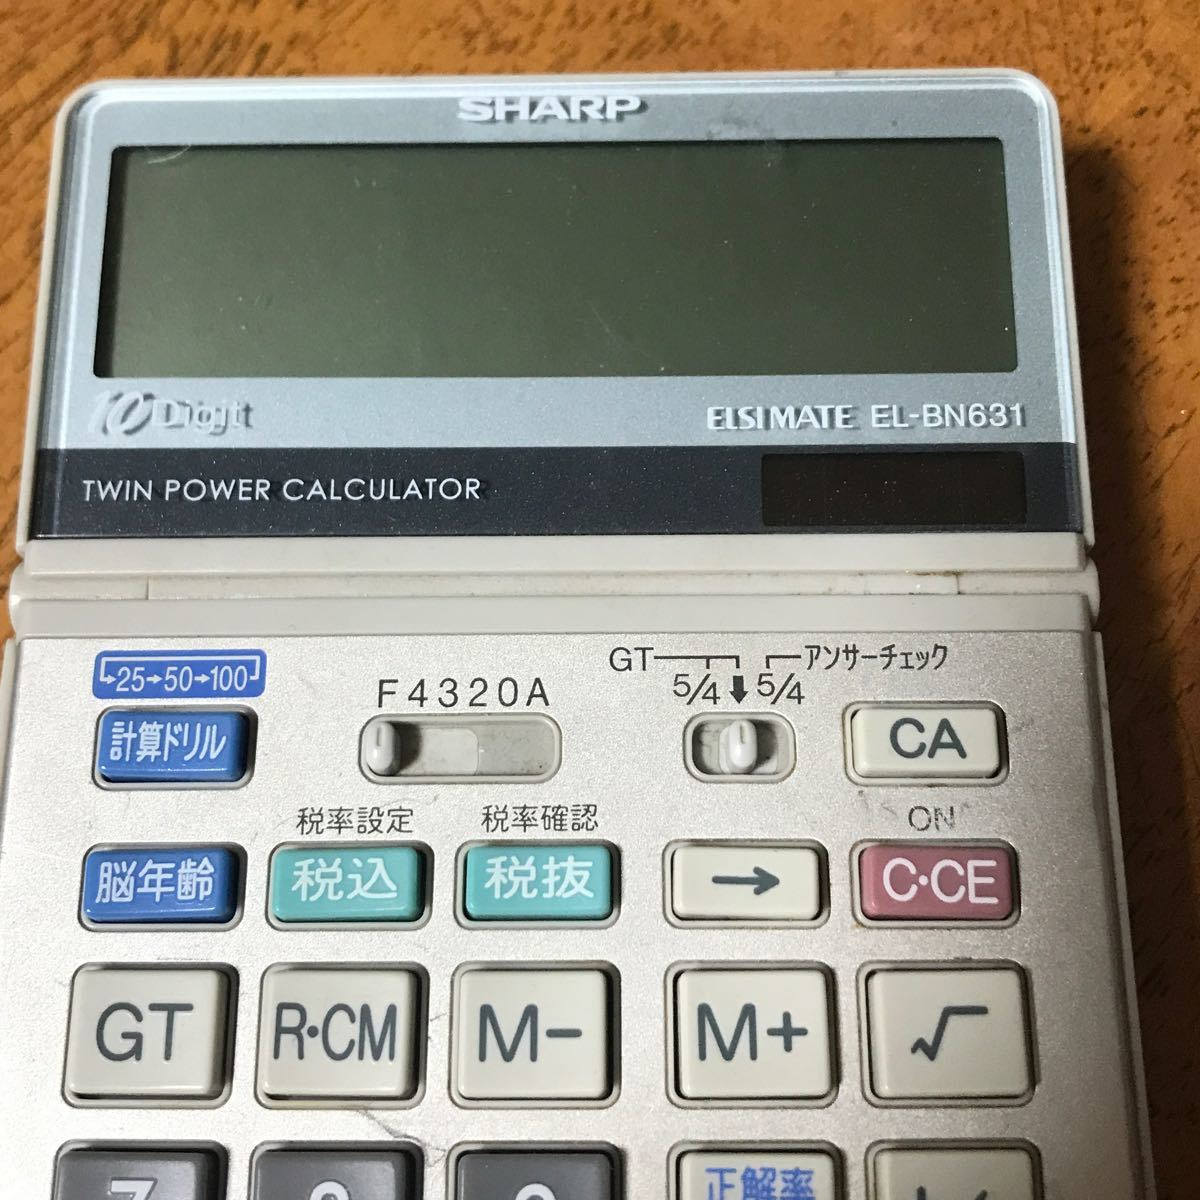 SHARP CASIO 関数電卓 シャープ 金融電卓 計算機 カシオ 電卓 カシオ電卓 PLUS